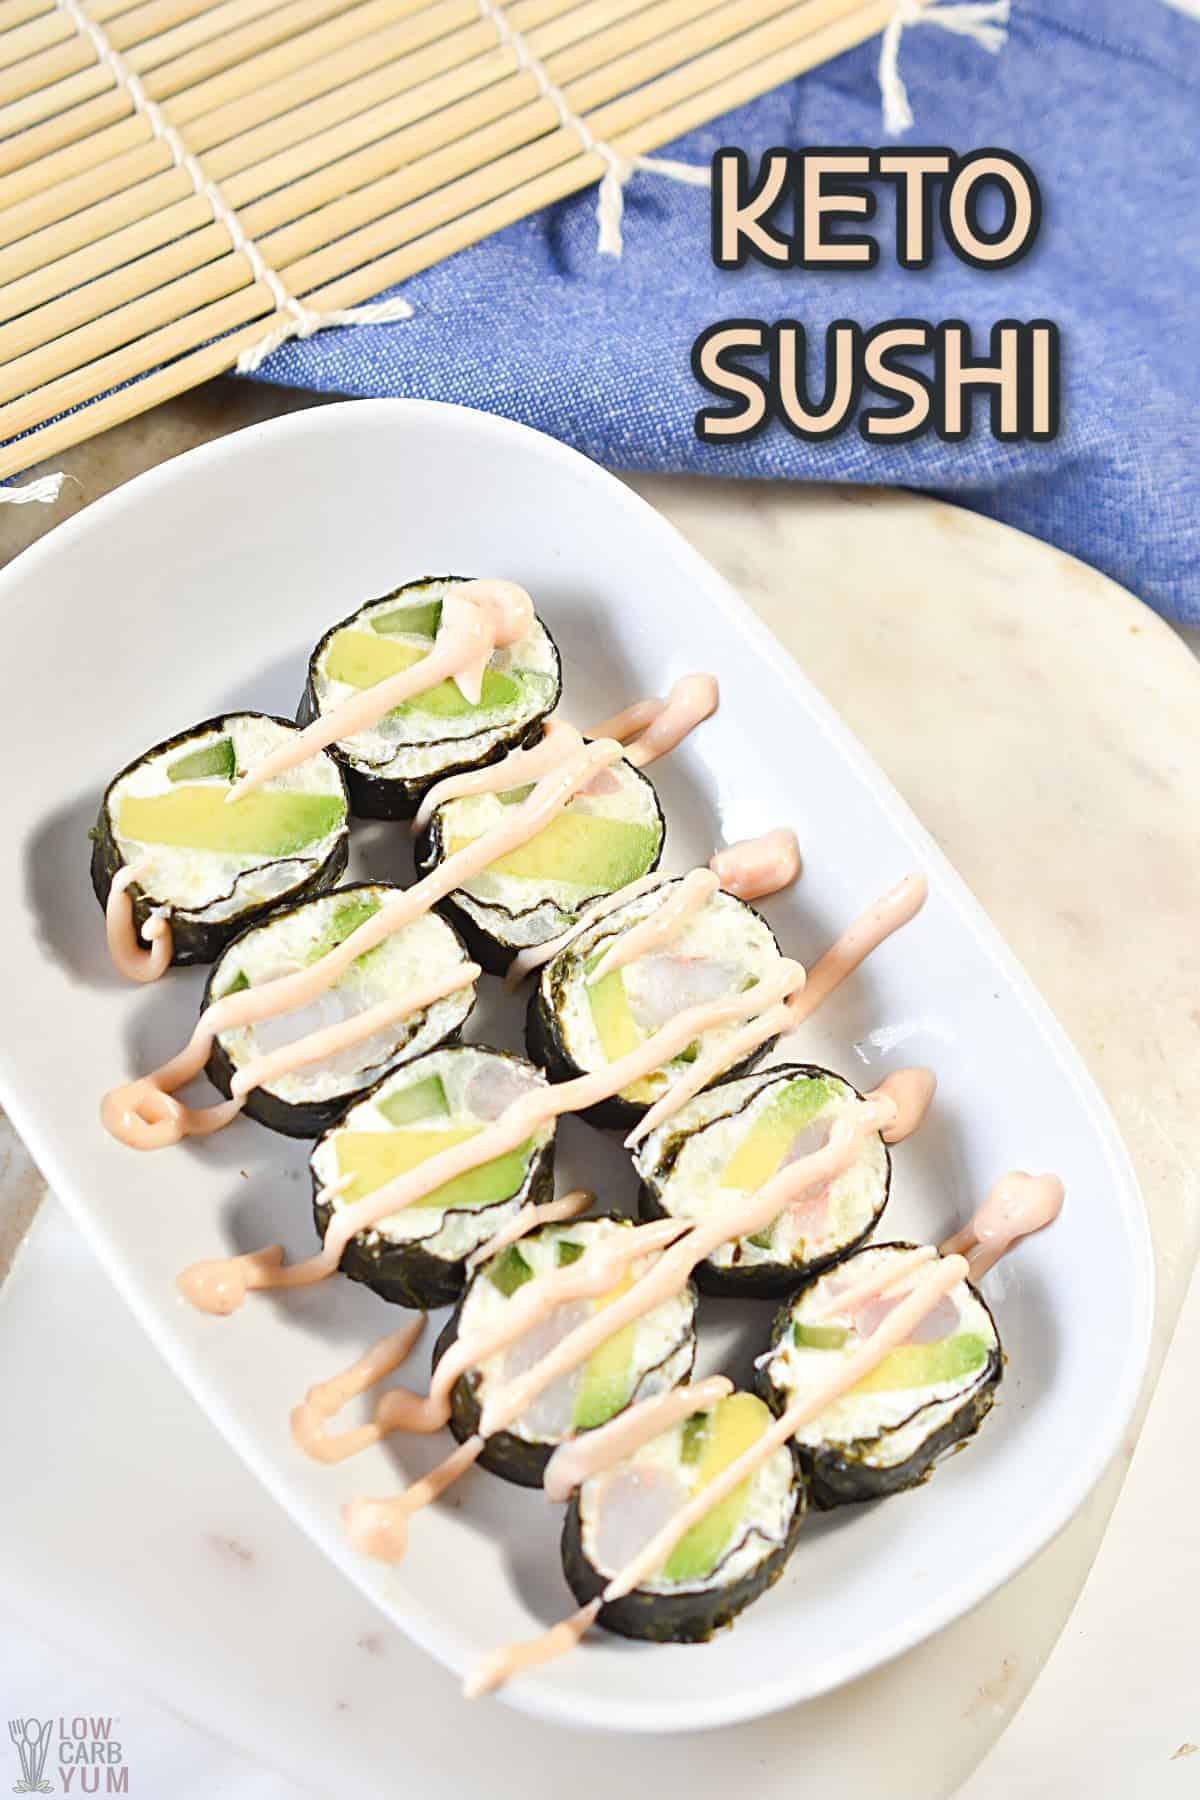 keto sushi cover image